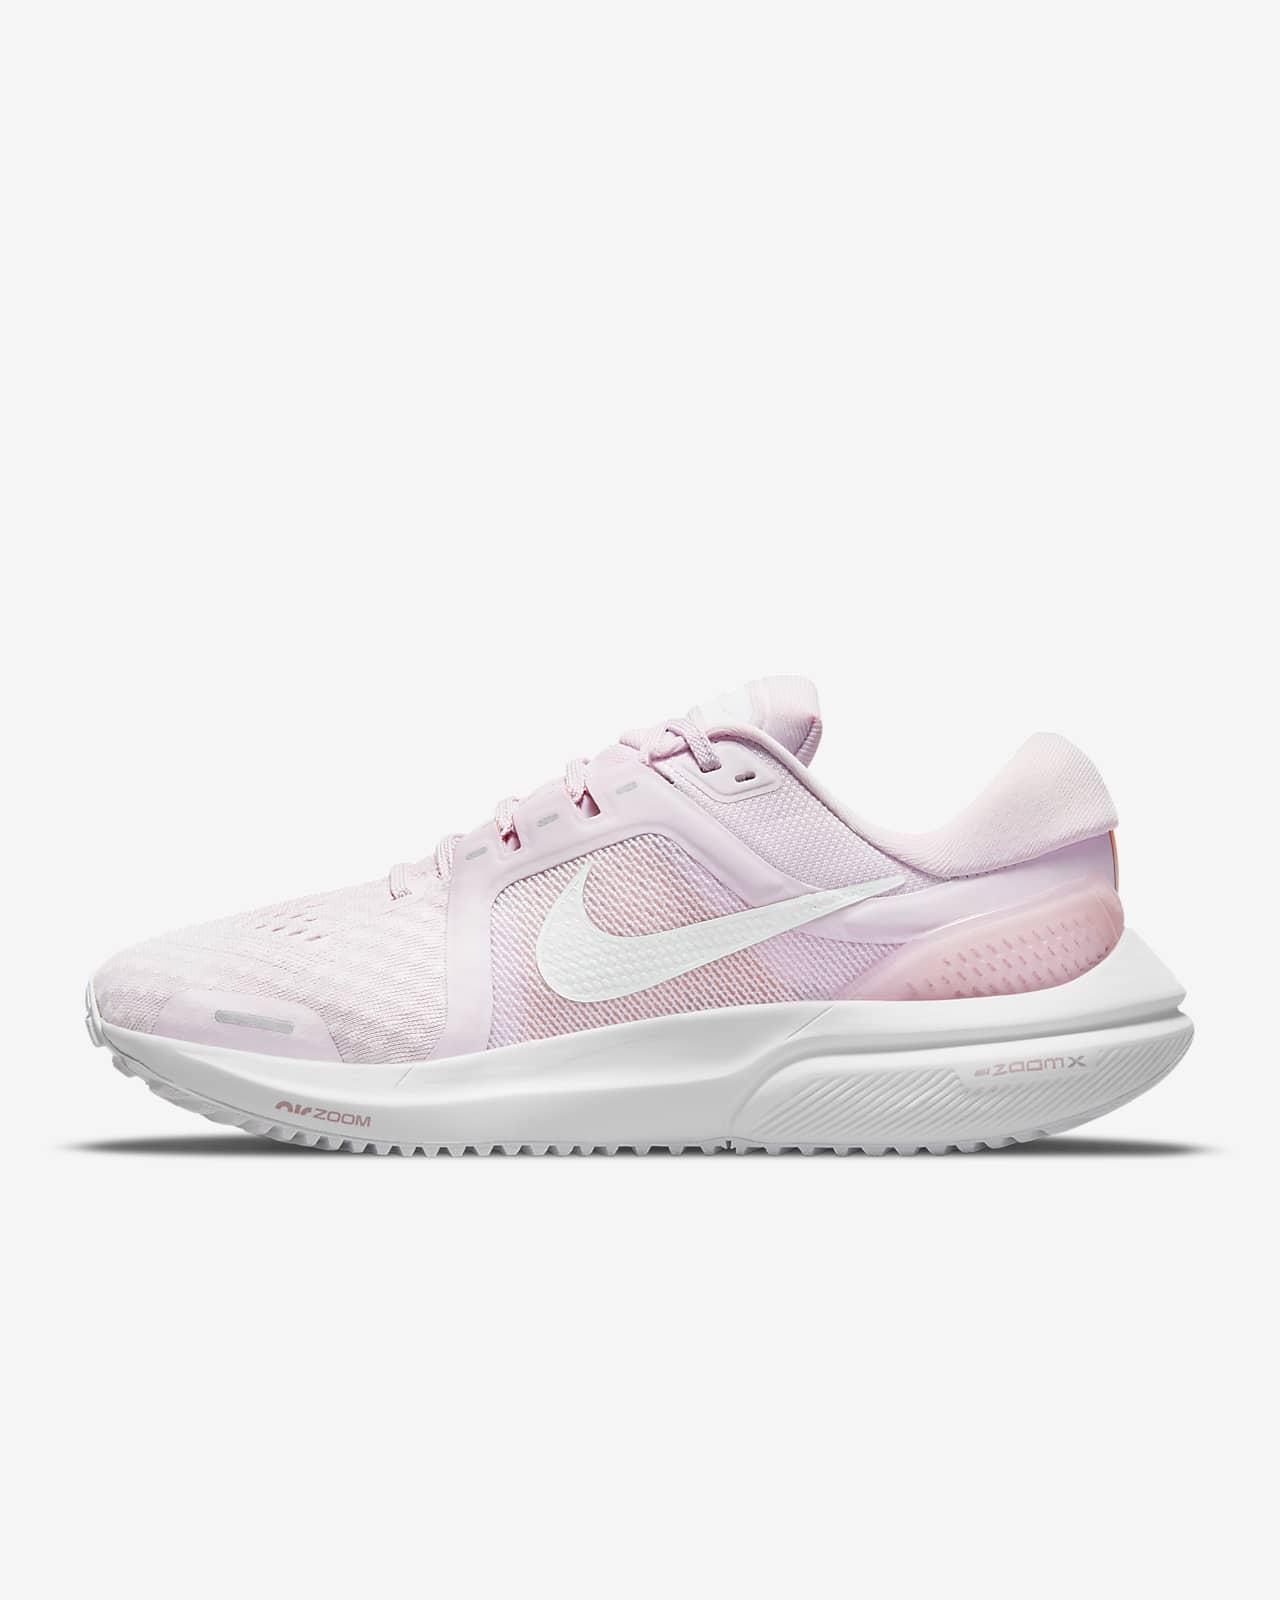 Chaussures de running sur route Nike Air Zoom Vomero 16 pour Femme ...